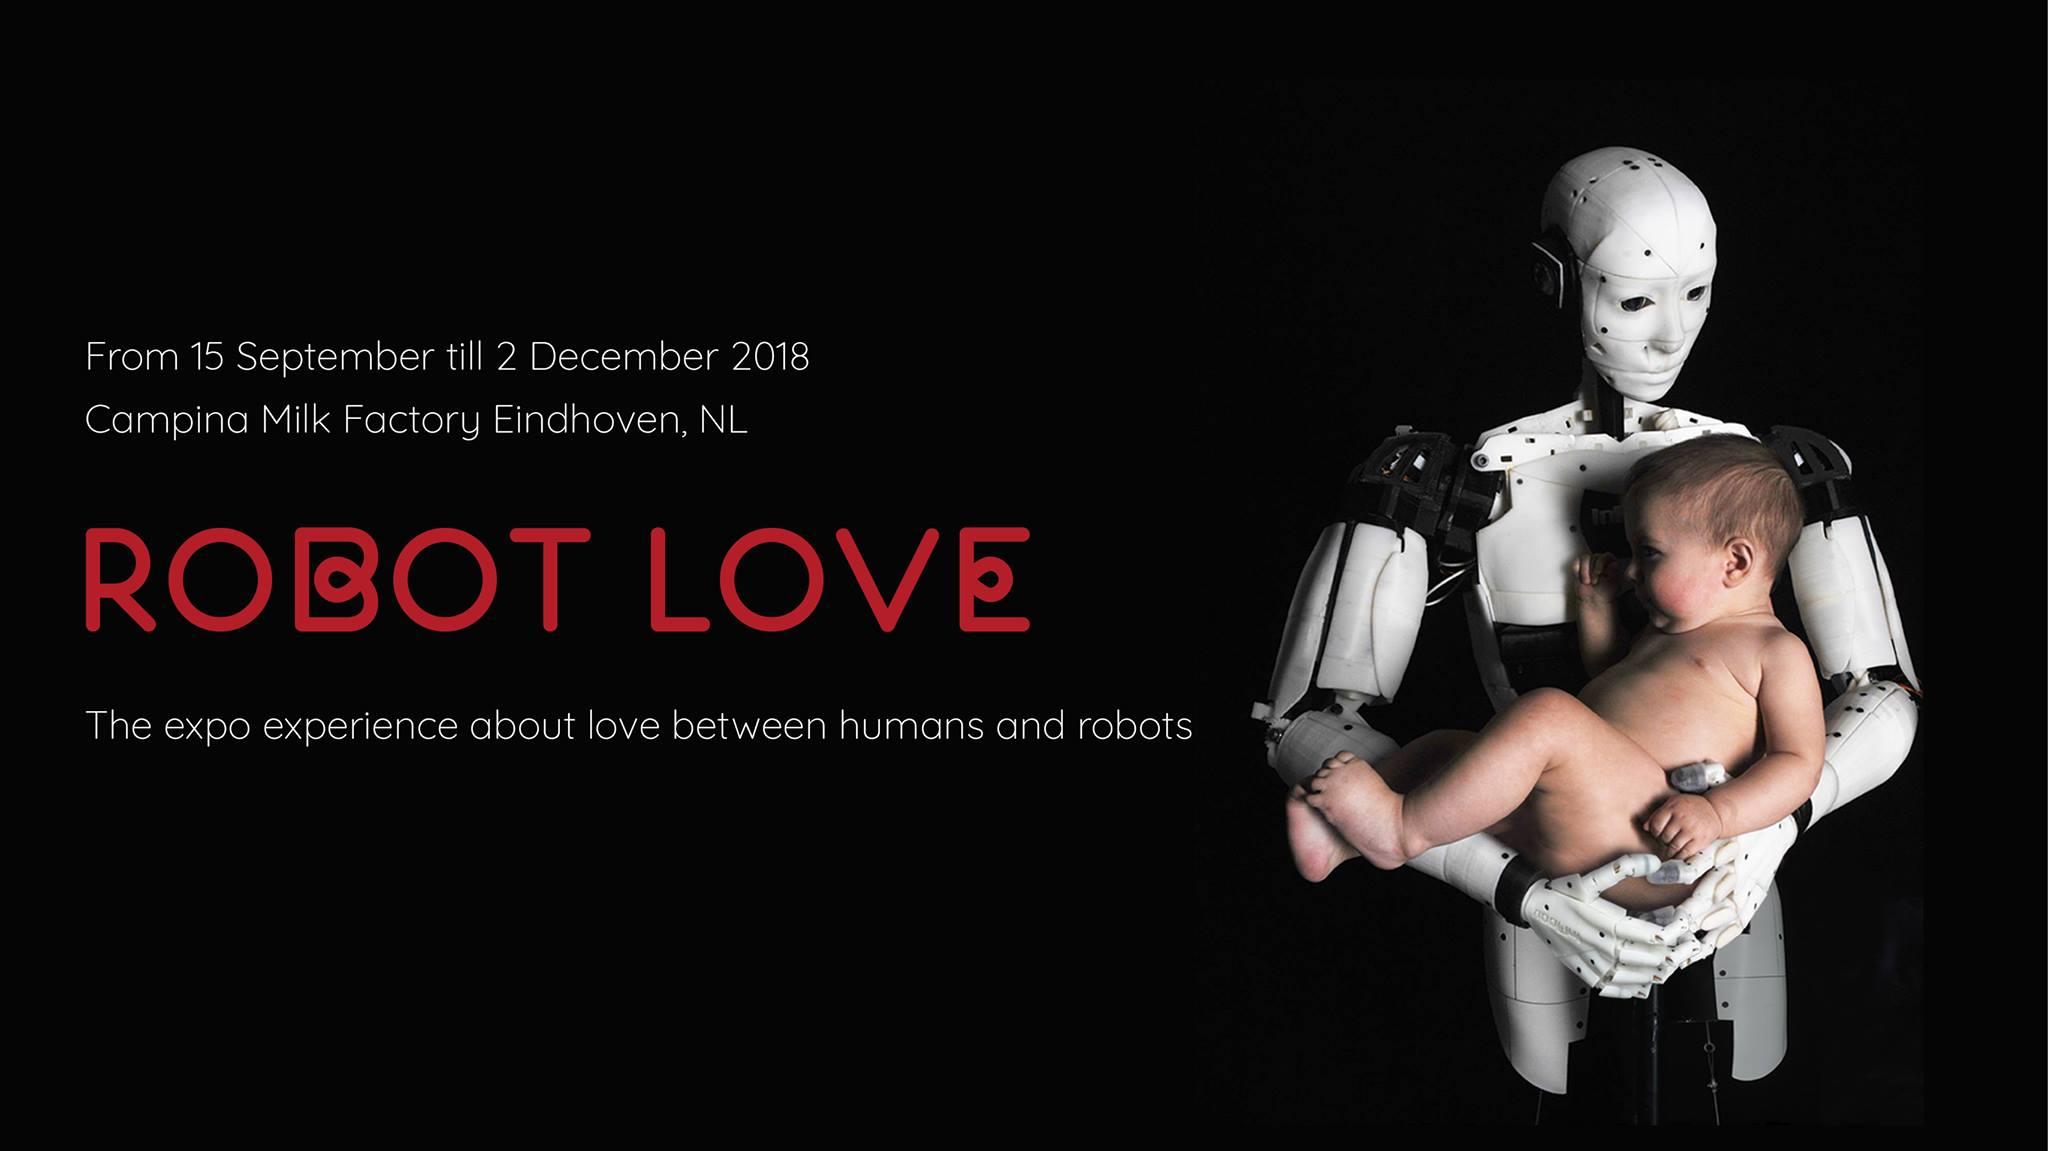 Emilio Vavarella in ROBOT LOVE (Eindhoven, NL)